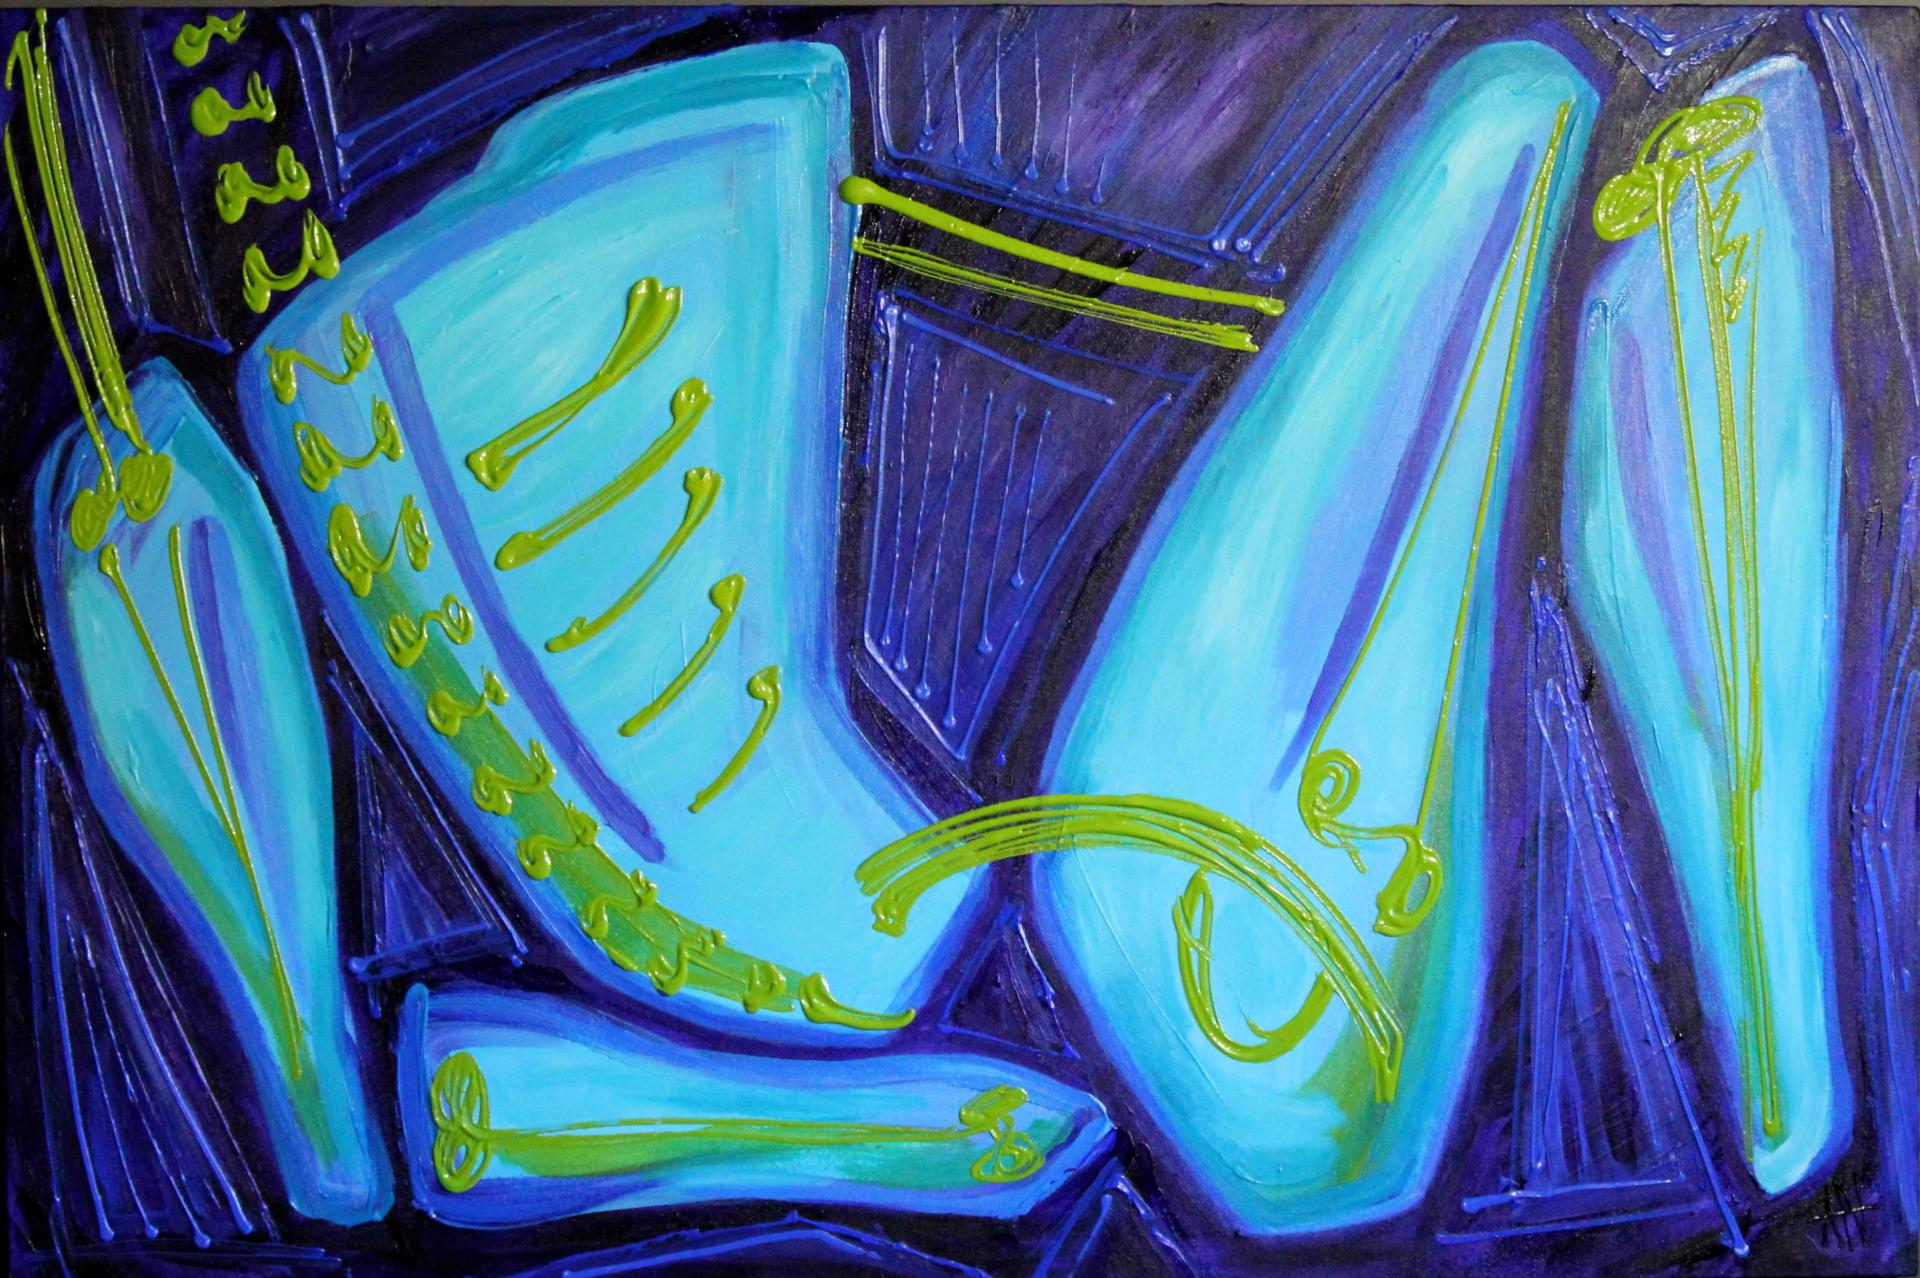 Reclining Blue, 2013